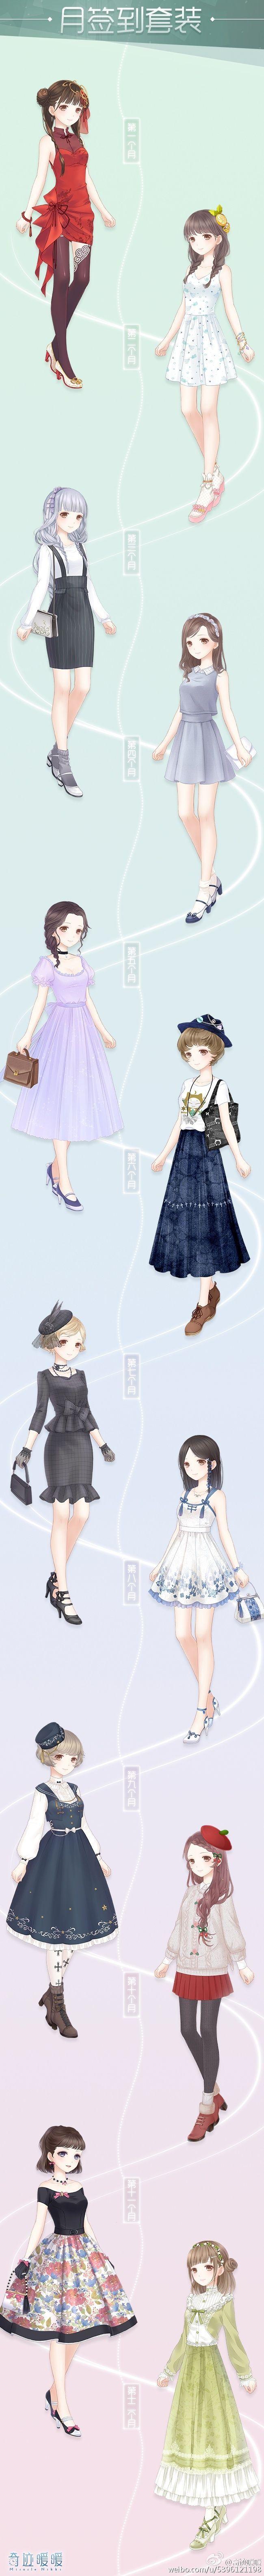 Anime girls... http://xn--80akibjkfl0bs.xn--p1acf/2017/02/03/anime-girls/  #animegirl  #animeeyes  #animeimpulse  #animech#ar#acters  #animeh#aven  #animew#all#aper  #animetv  #animemovies  #animef#avor  #anime#ames  #anime  #animememes  #animeexpo  #animedr#awings  #ani#art  #ani#av#at#arcr#ator  #ani#angel  #ani#ani#als  #ani#aw#ards  #ani#app  #ani#another  #ani#amino  #ani#aesthetic  #ani#amer#a  #animeboy  #animech#ar#acter  #animegirl#ame  #animerecomme#ations  #animegirl…